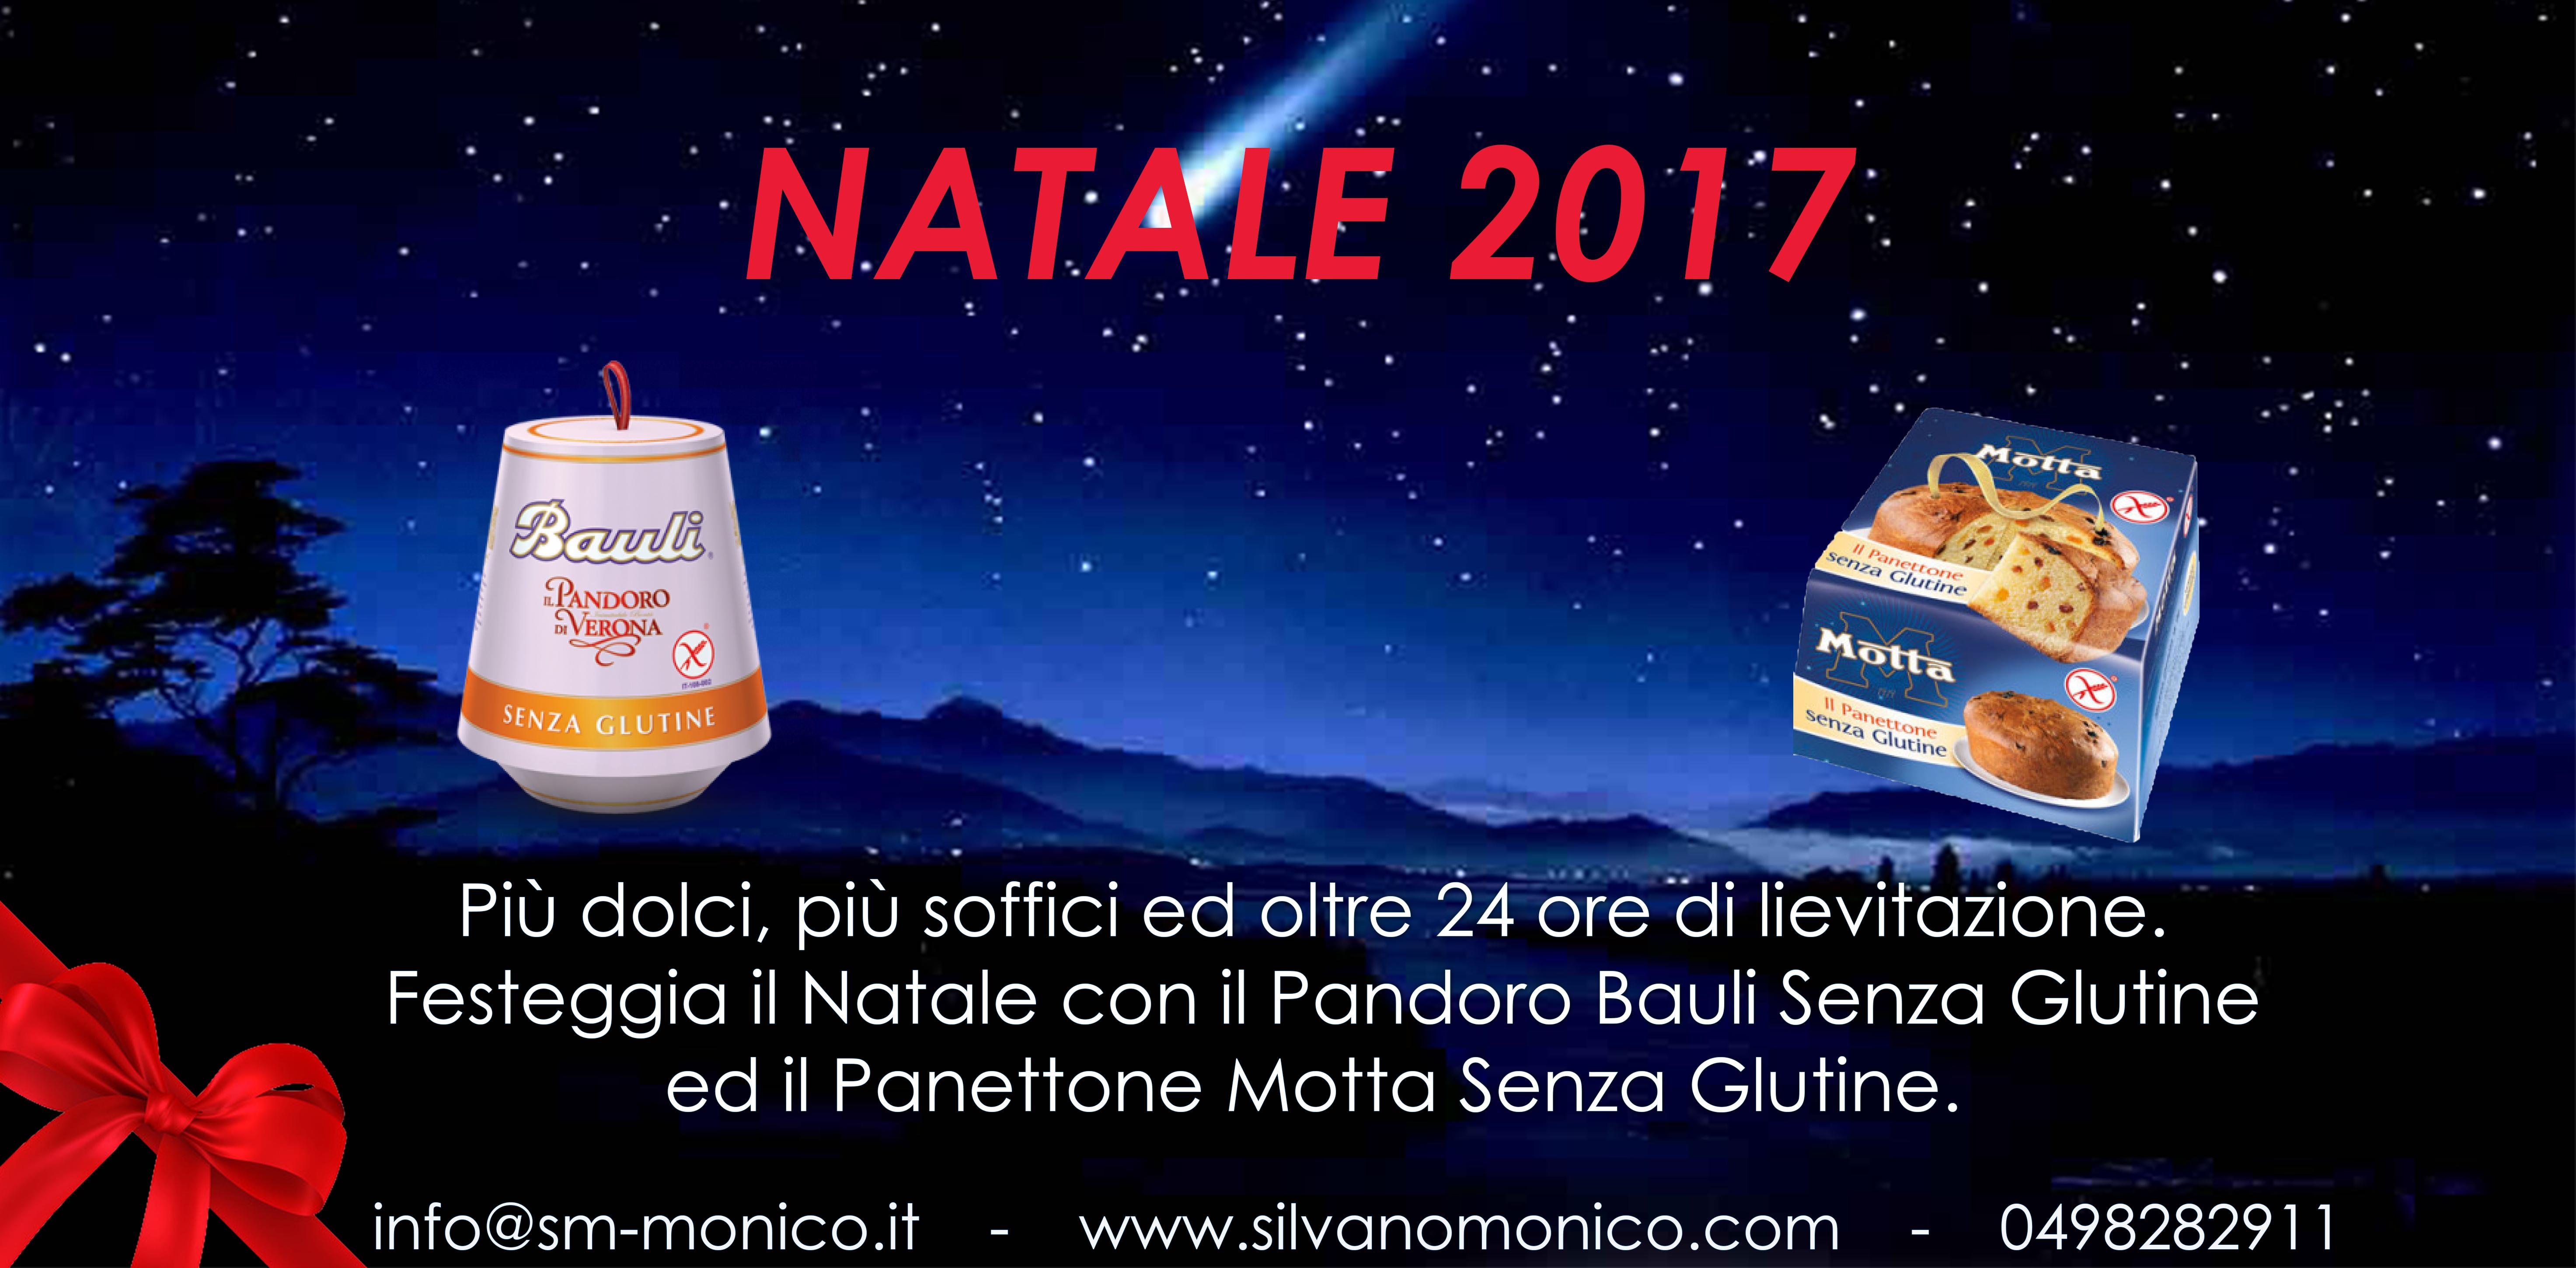 Bauli e Motta Senza Glutine2017